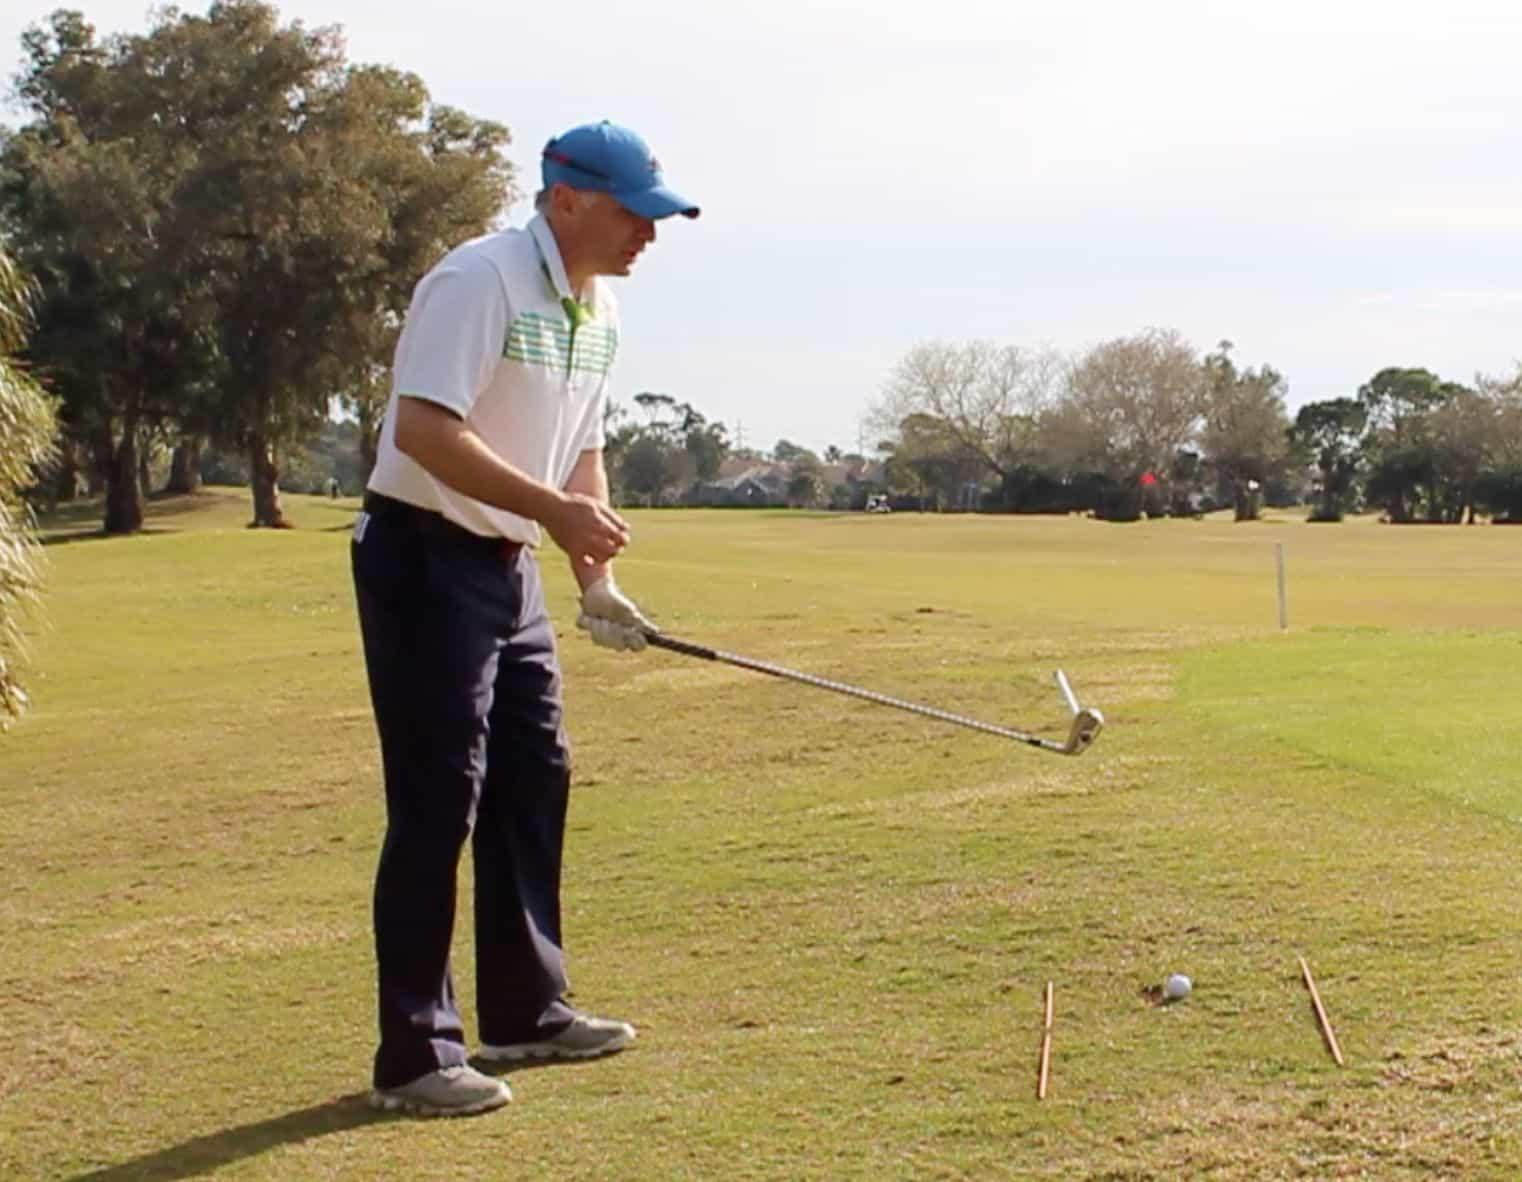 Golf Ball Above Feet Aiming